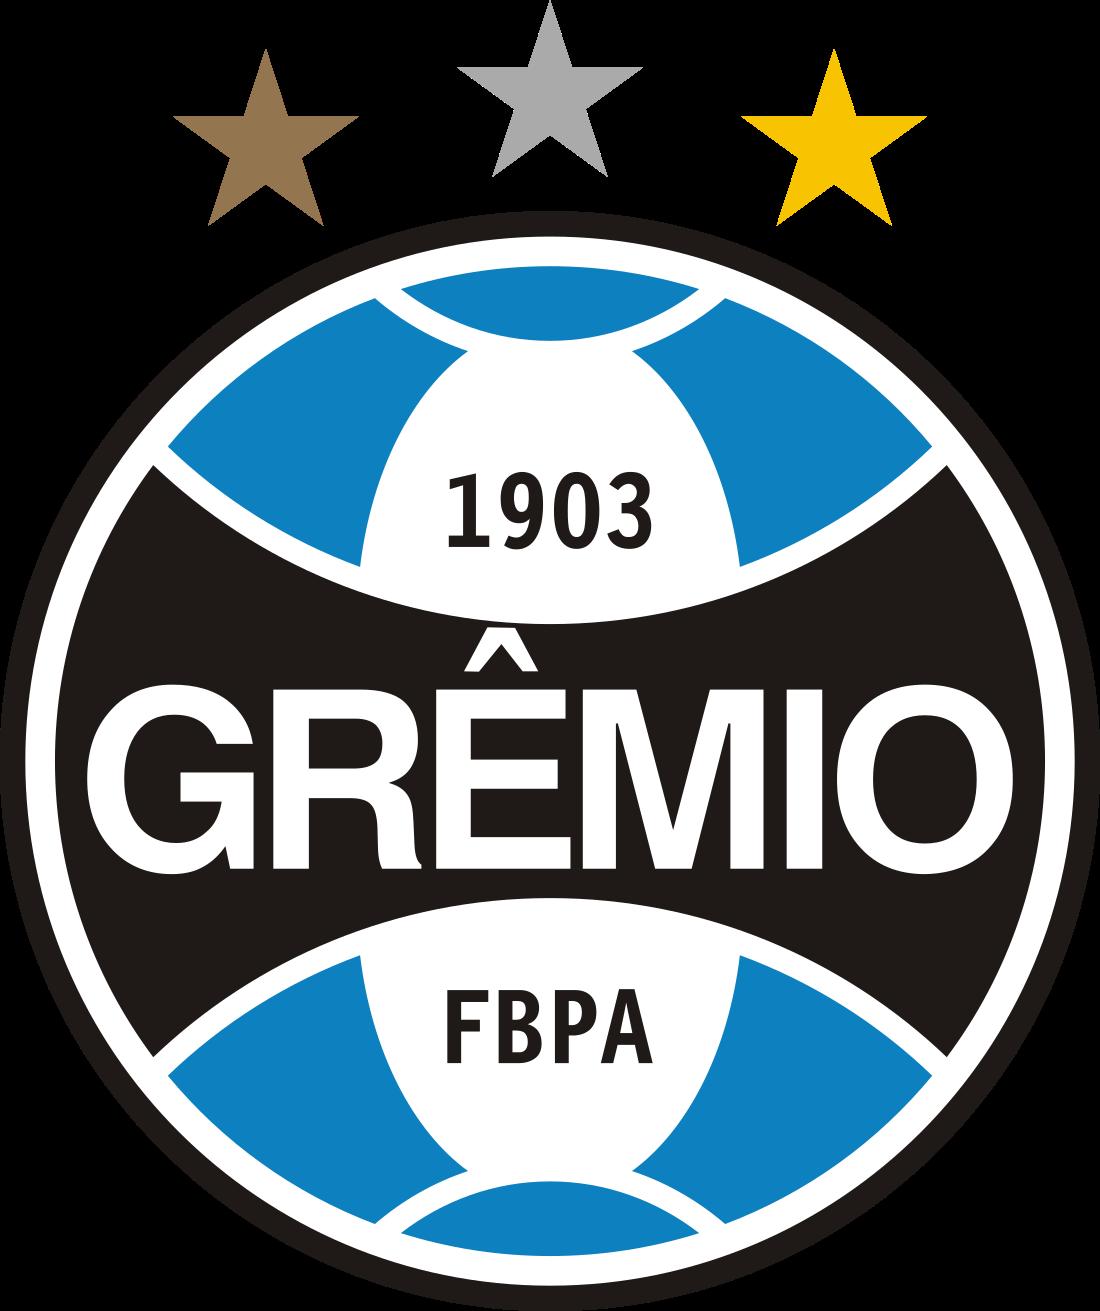 gremio logo escudo 5 - Grêmio Logo - Grêmio Escudo